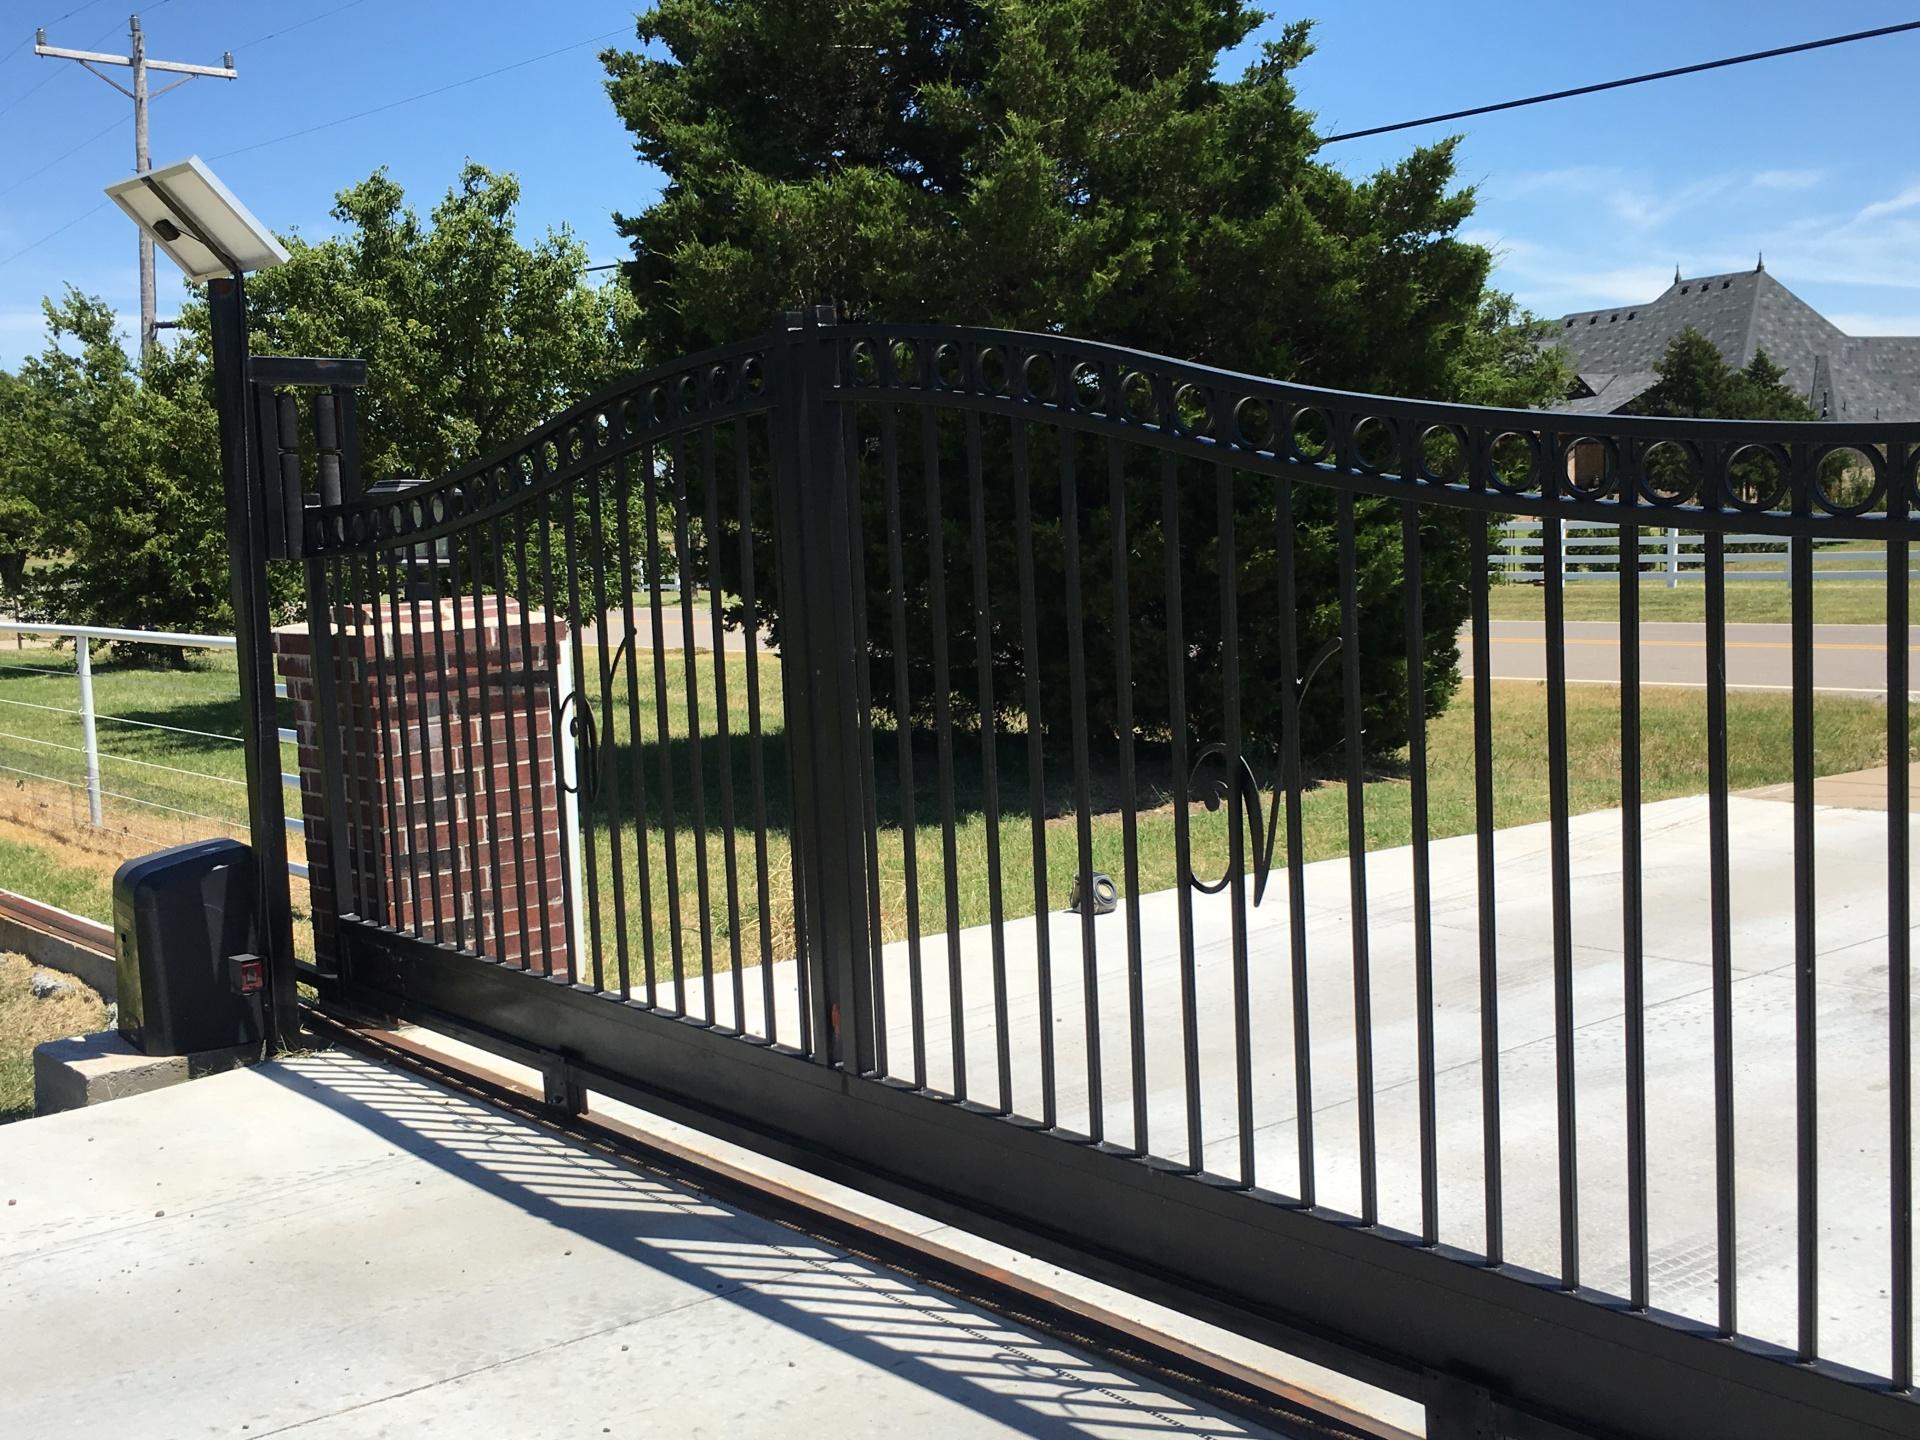 Beautiful - Iron Driveway Gate - Gate opener - slide gate - solar access - edmond fence company - oklahoma fence